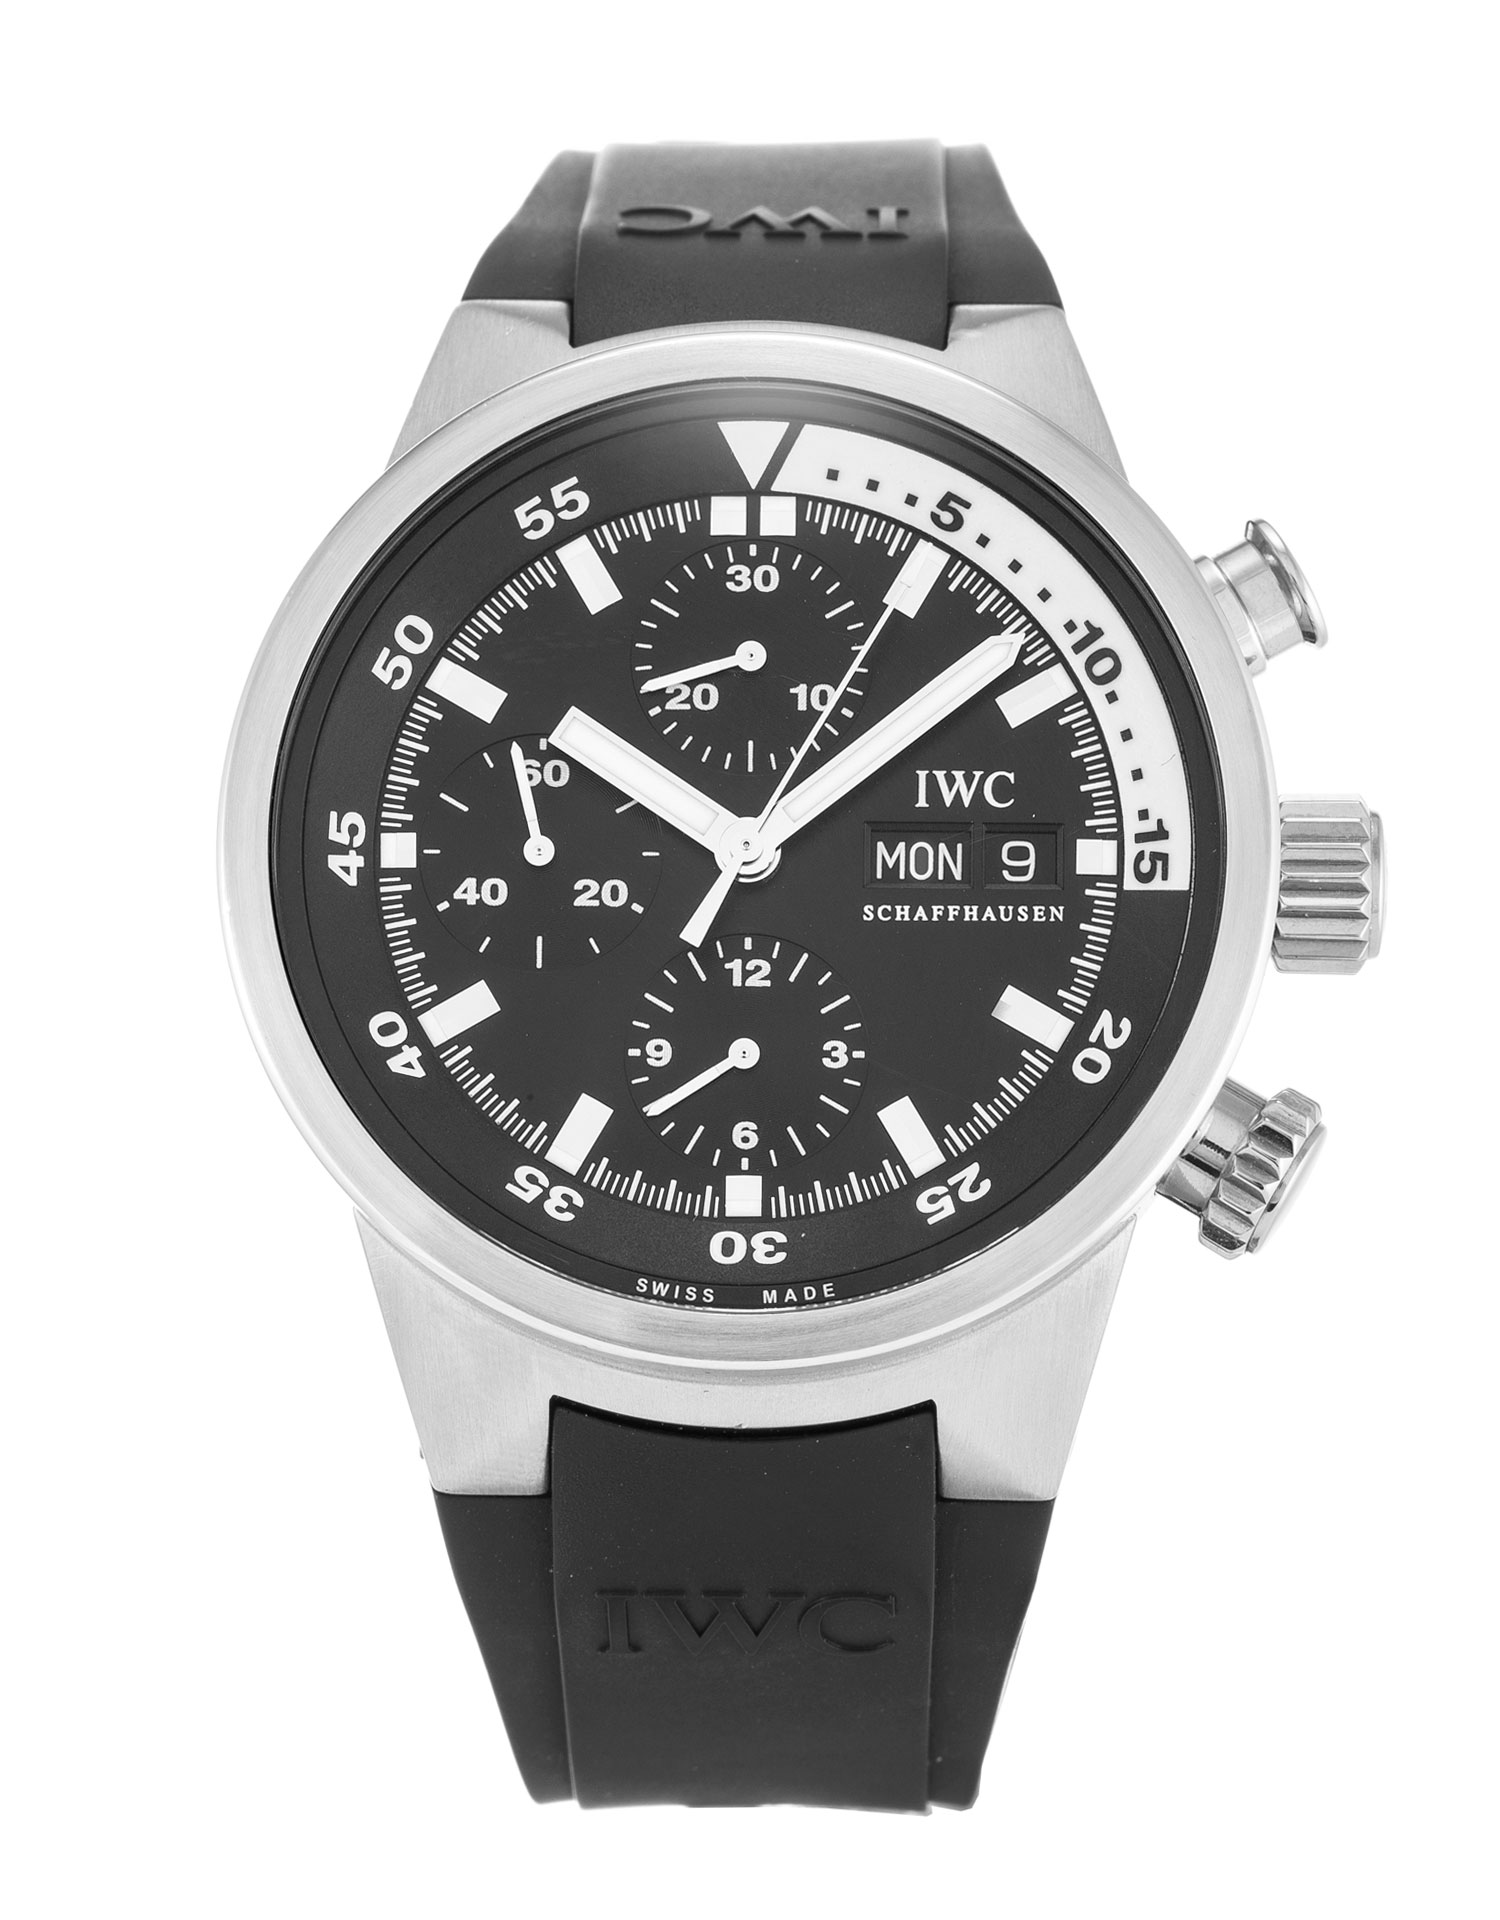 aad804816ce Replica IWC Aquatimer IW371933-42 MM